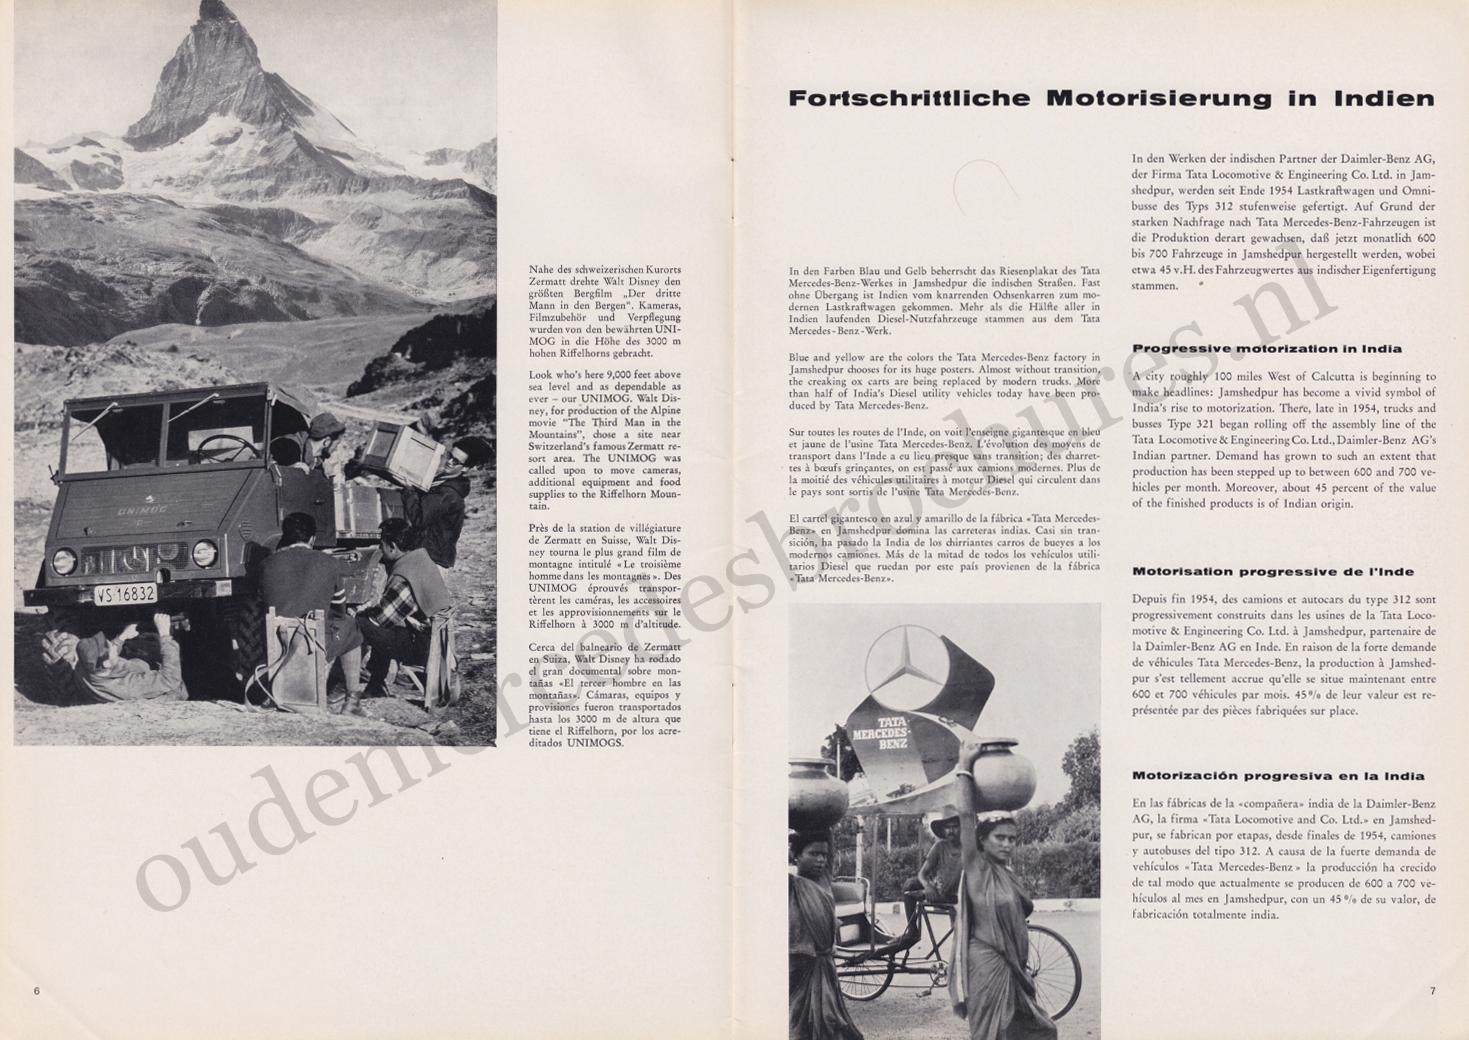 (REVISTA): Periódico In aller welt n.º 30 - Mercedes-Benz no mundo - 1959 - multilingue 004